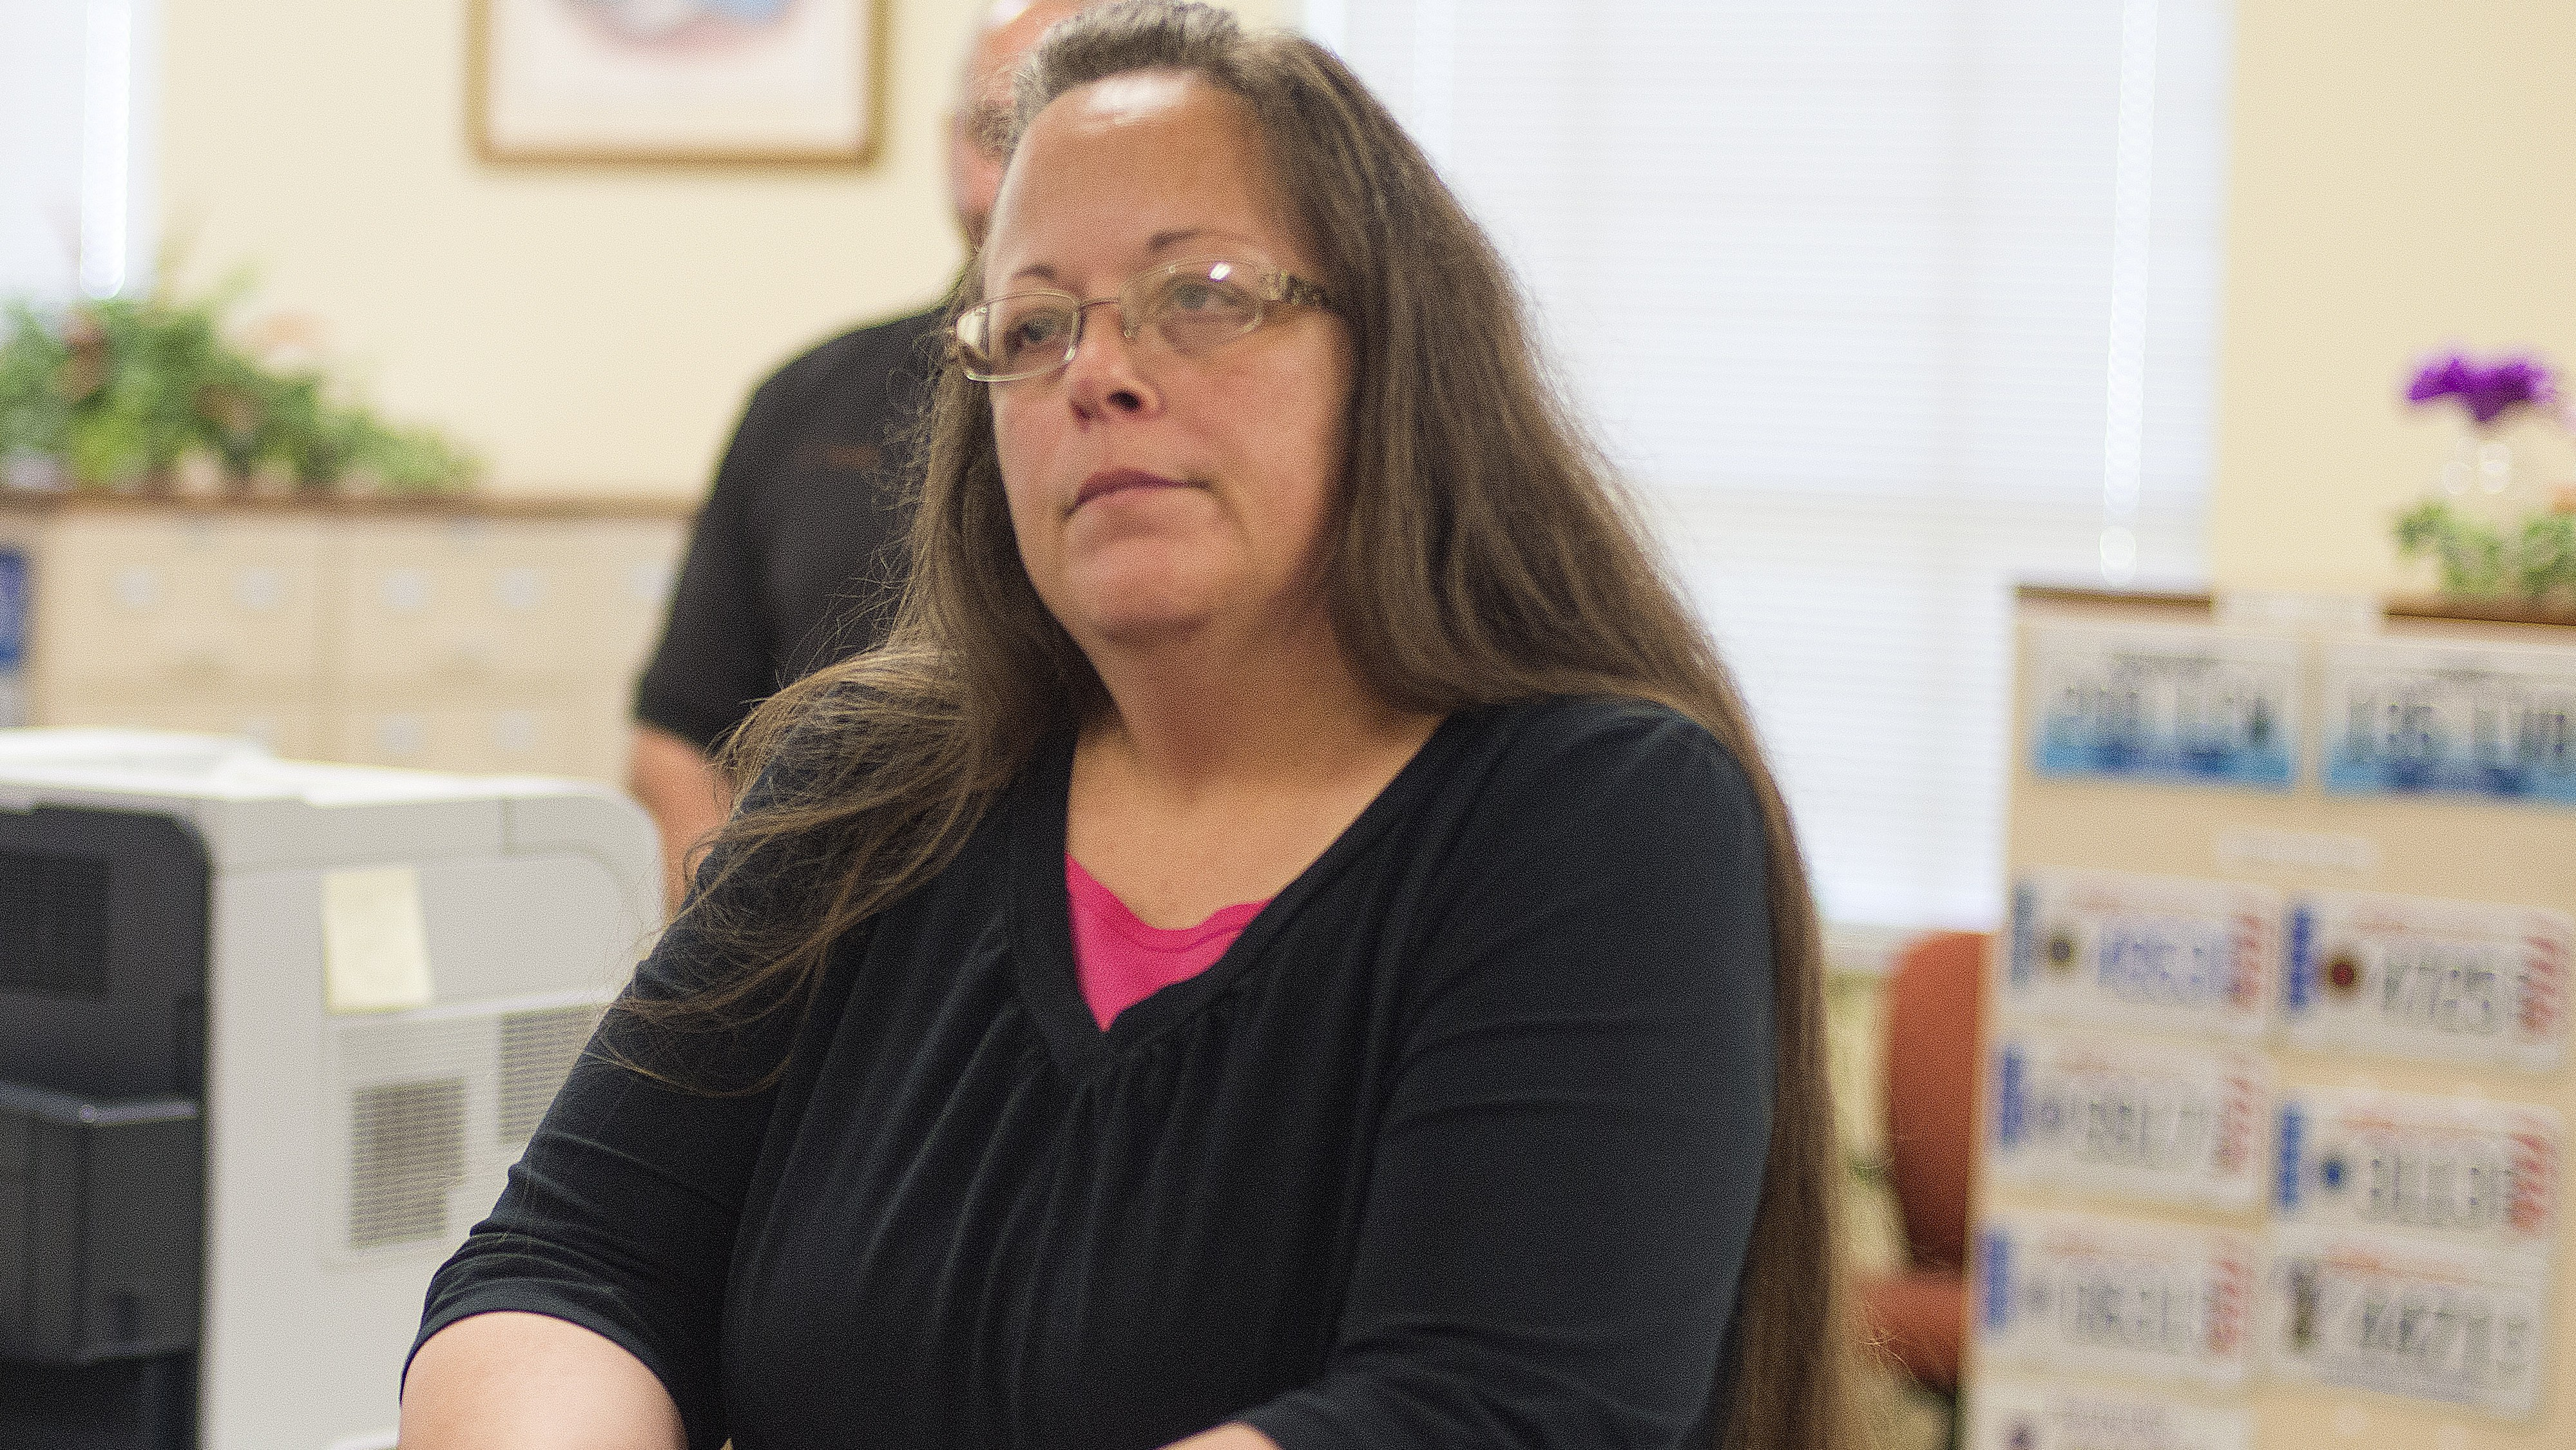 Kim Davis, Kim Davis jail, Kim Davis judge, Kim Davis contempt of court